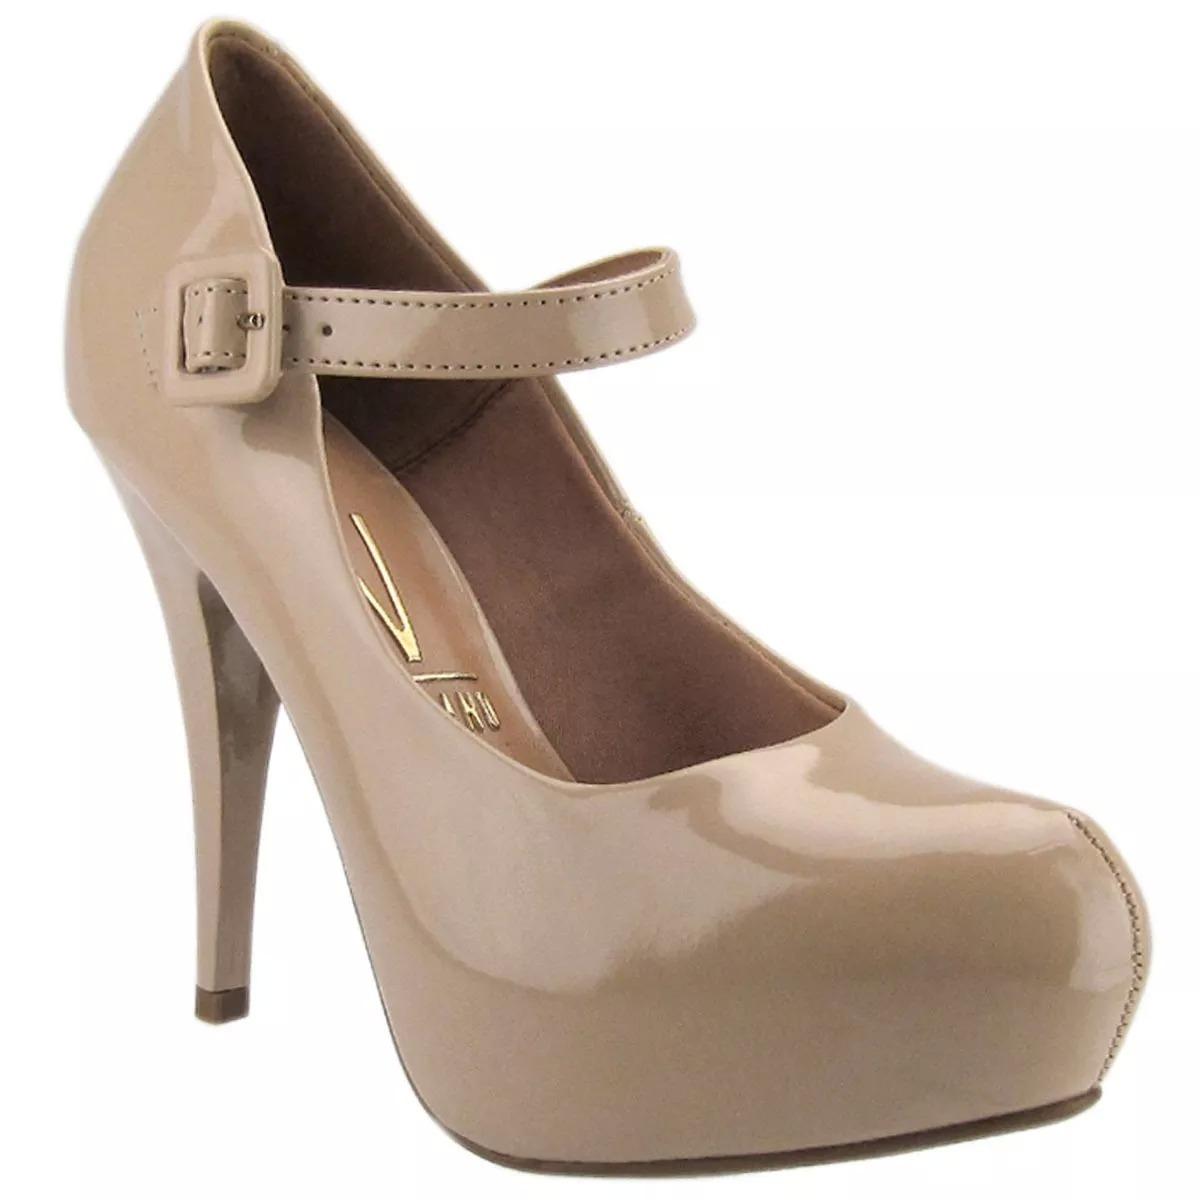 a9125c187 sapato feminino scarpin boneca vizzano verniz meia pata. Carregando zoom.